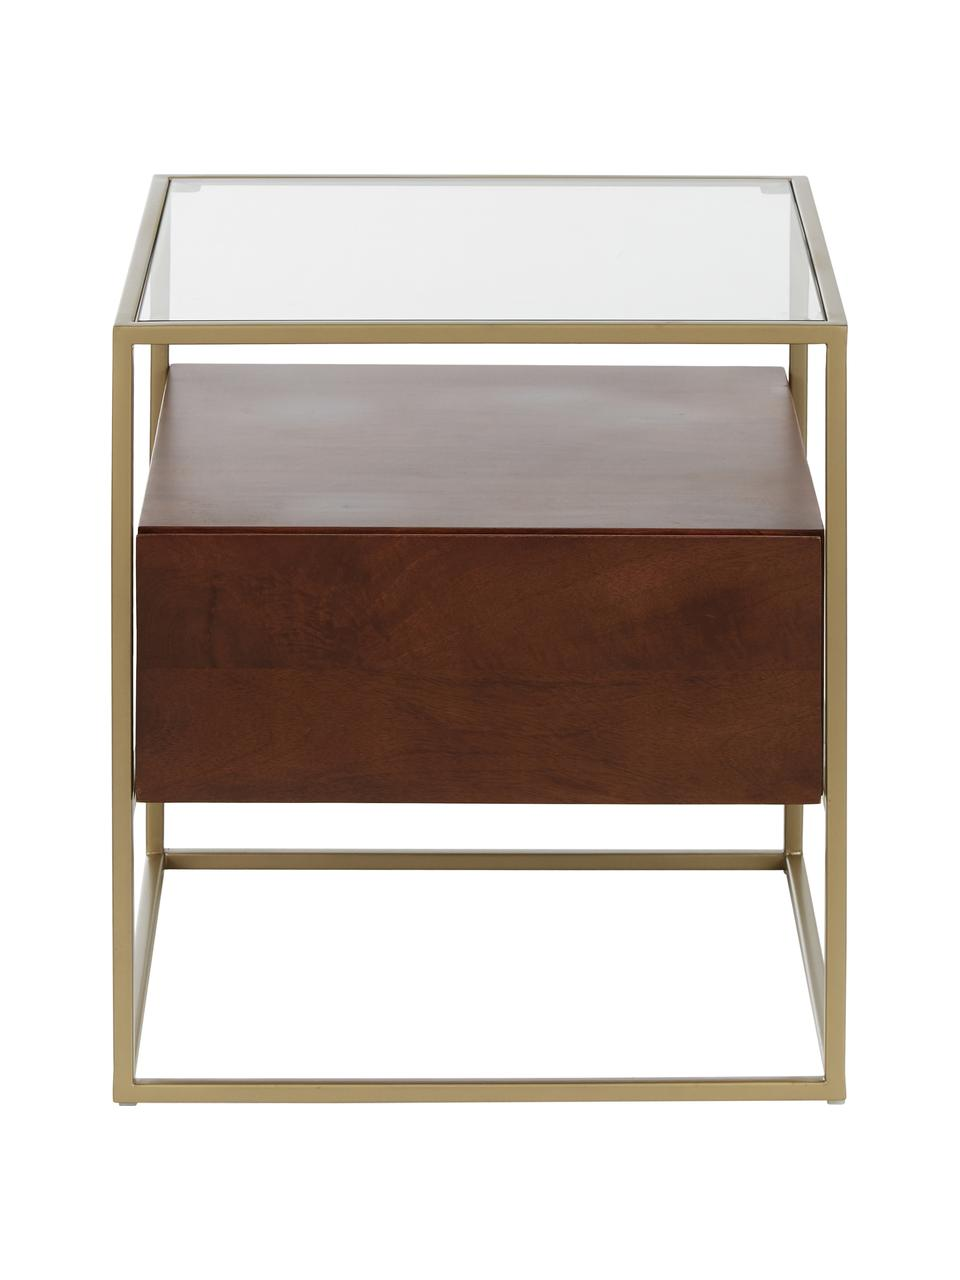 Nachtkastje Theodor met lade, Tafelblad: glas, Frame: gepoedercoat metaal, Transparant, mangohoutkleurig, goudkleurig, 50 x 50 cm